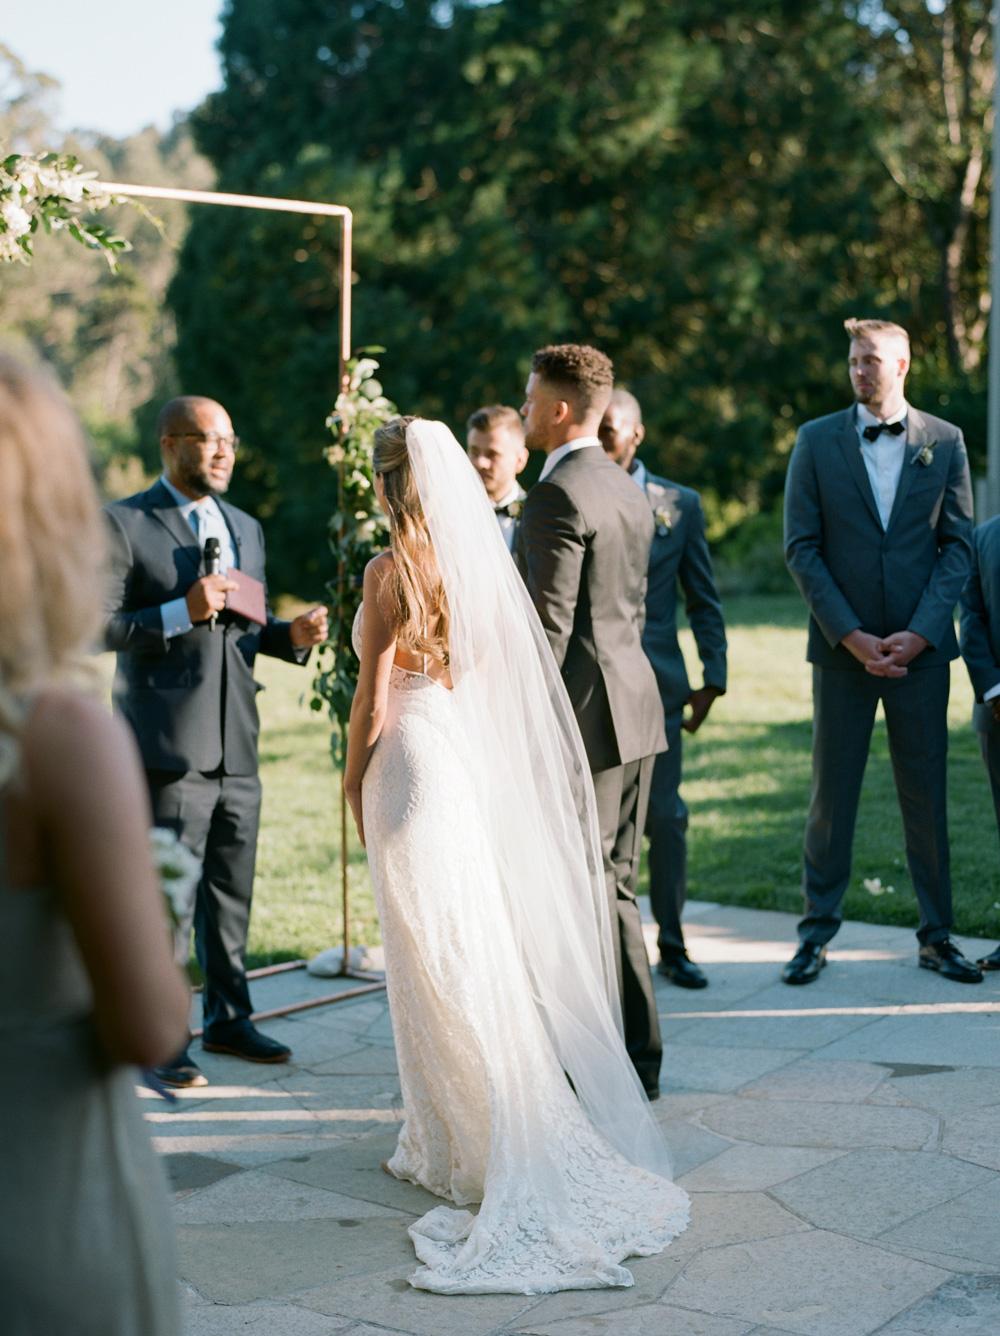 kateweinsteinphoto_korn_wedding-161.jpg